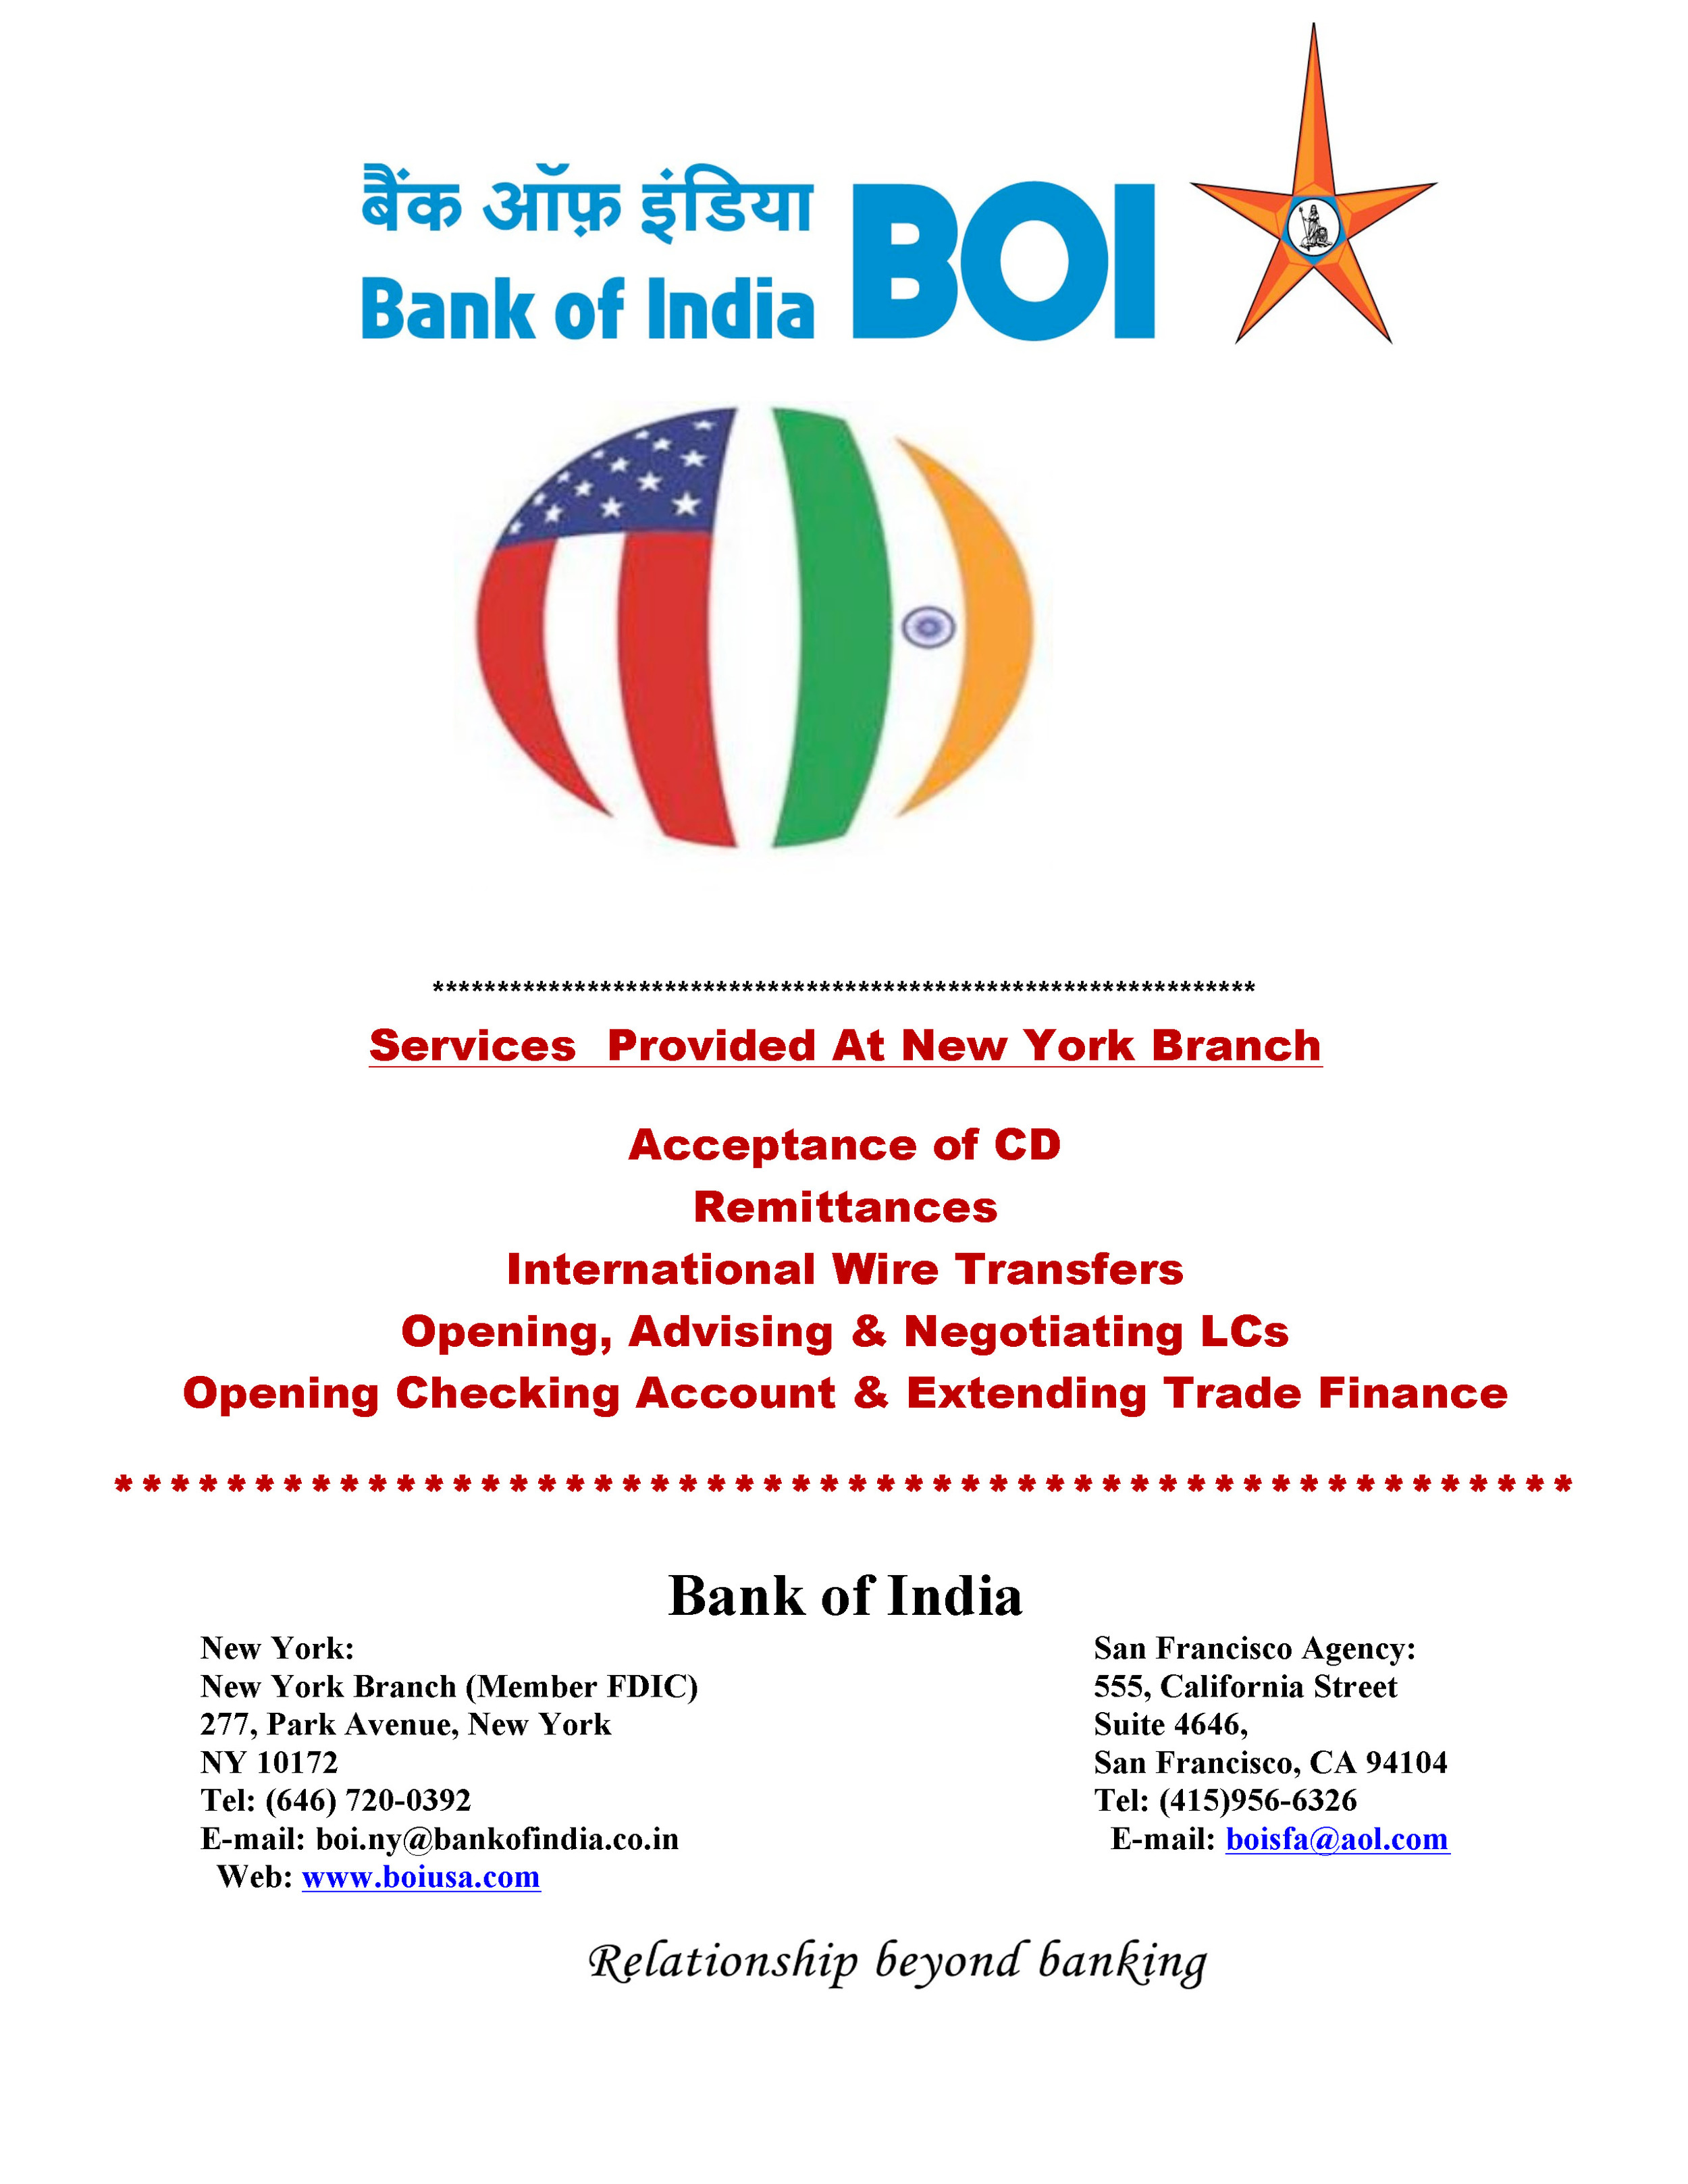 BankofIndia_InternationalHindiConference.jpg